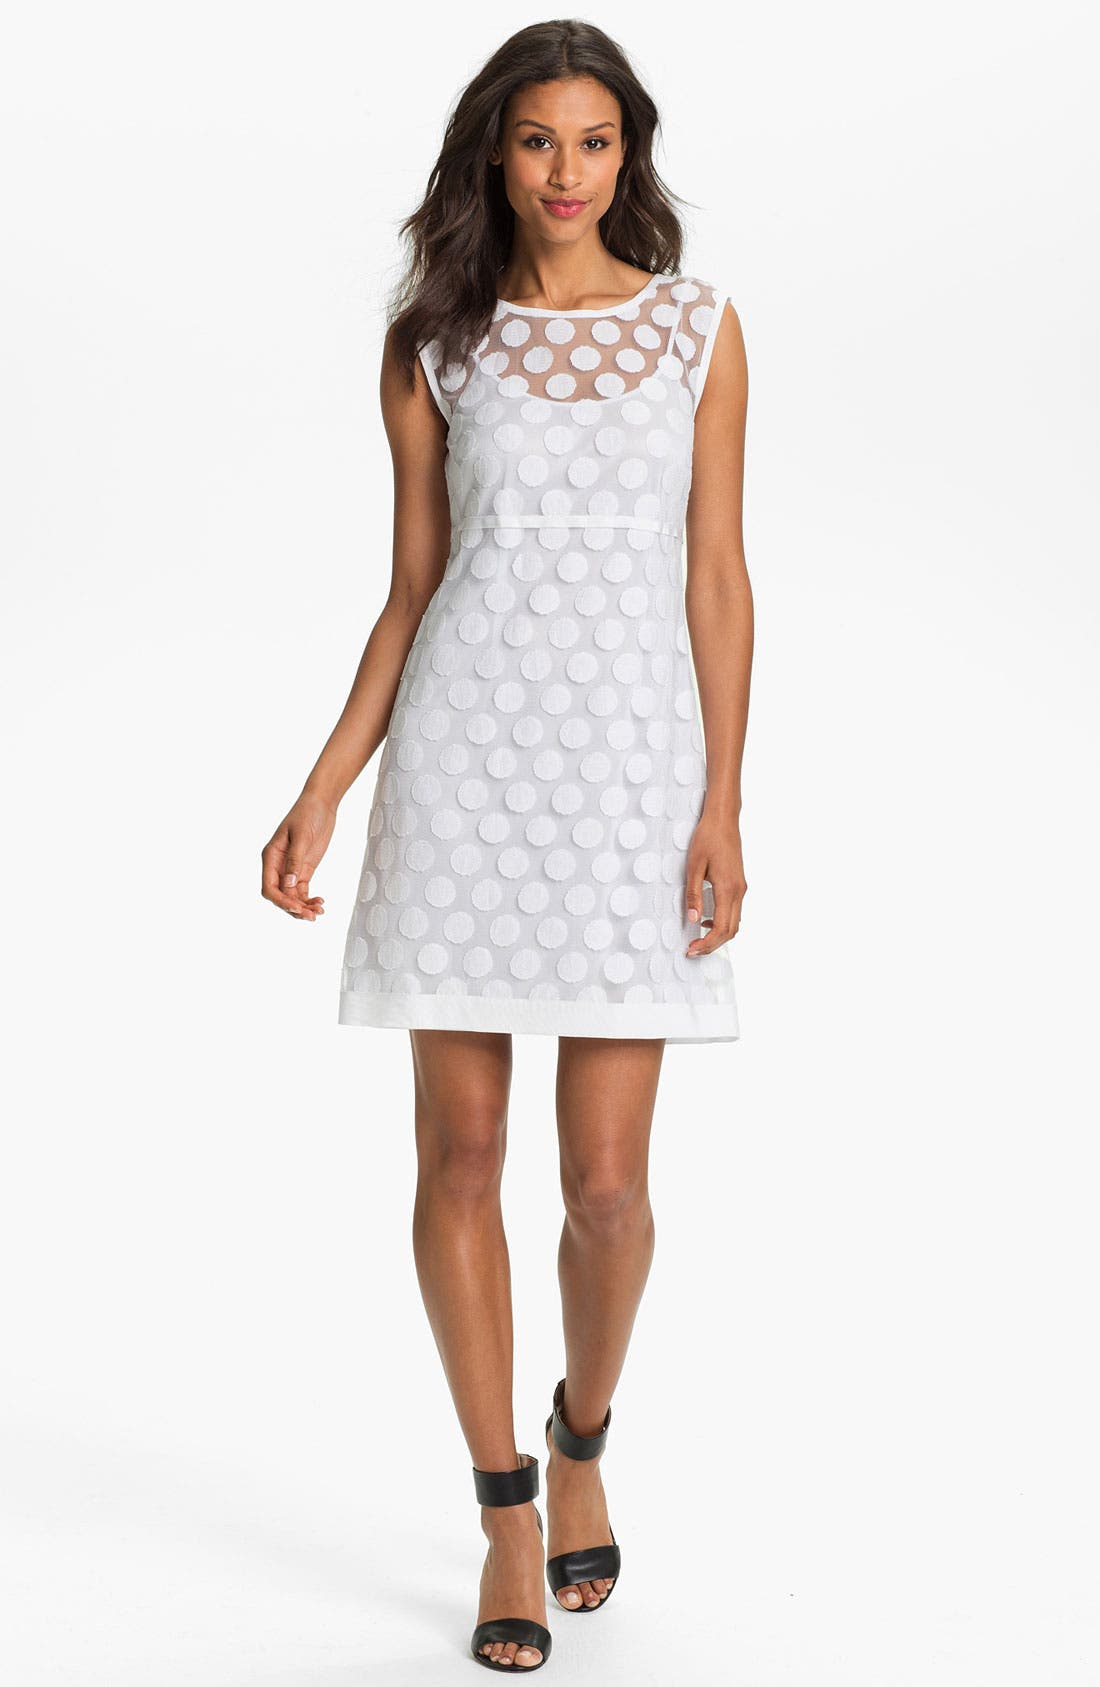 Main Image - Laundry by Shelli Segal Polka Dot Lace A-Line Dress